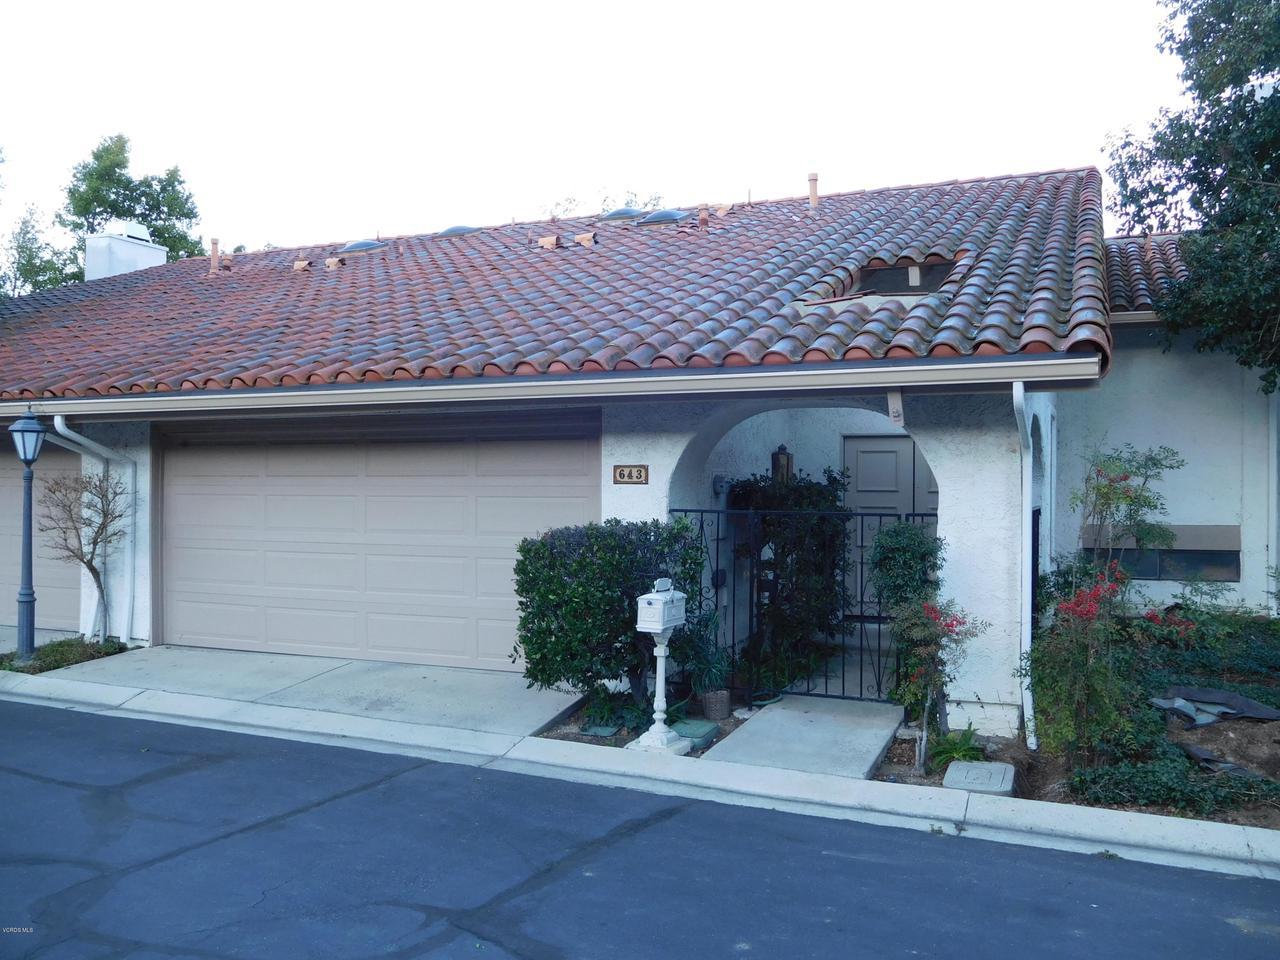 Photo of 643 ARROYO OAKS DRIVE, Westlake Village, CA 91362